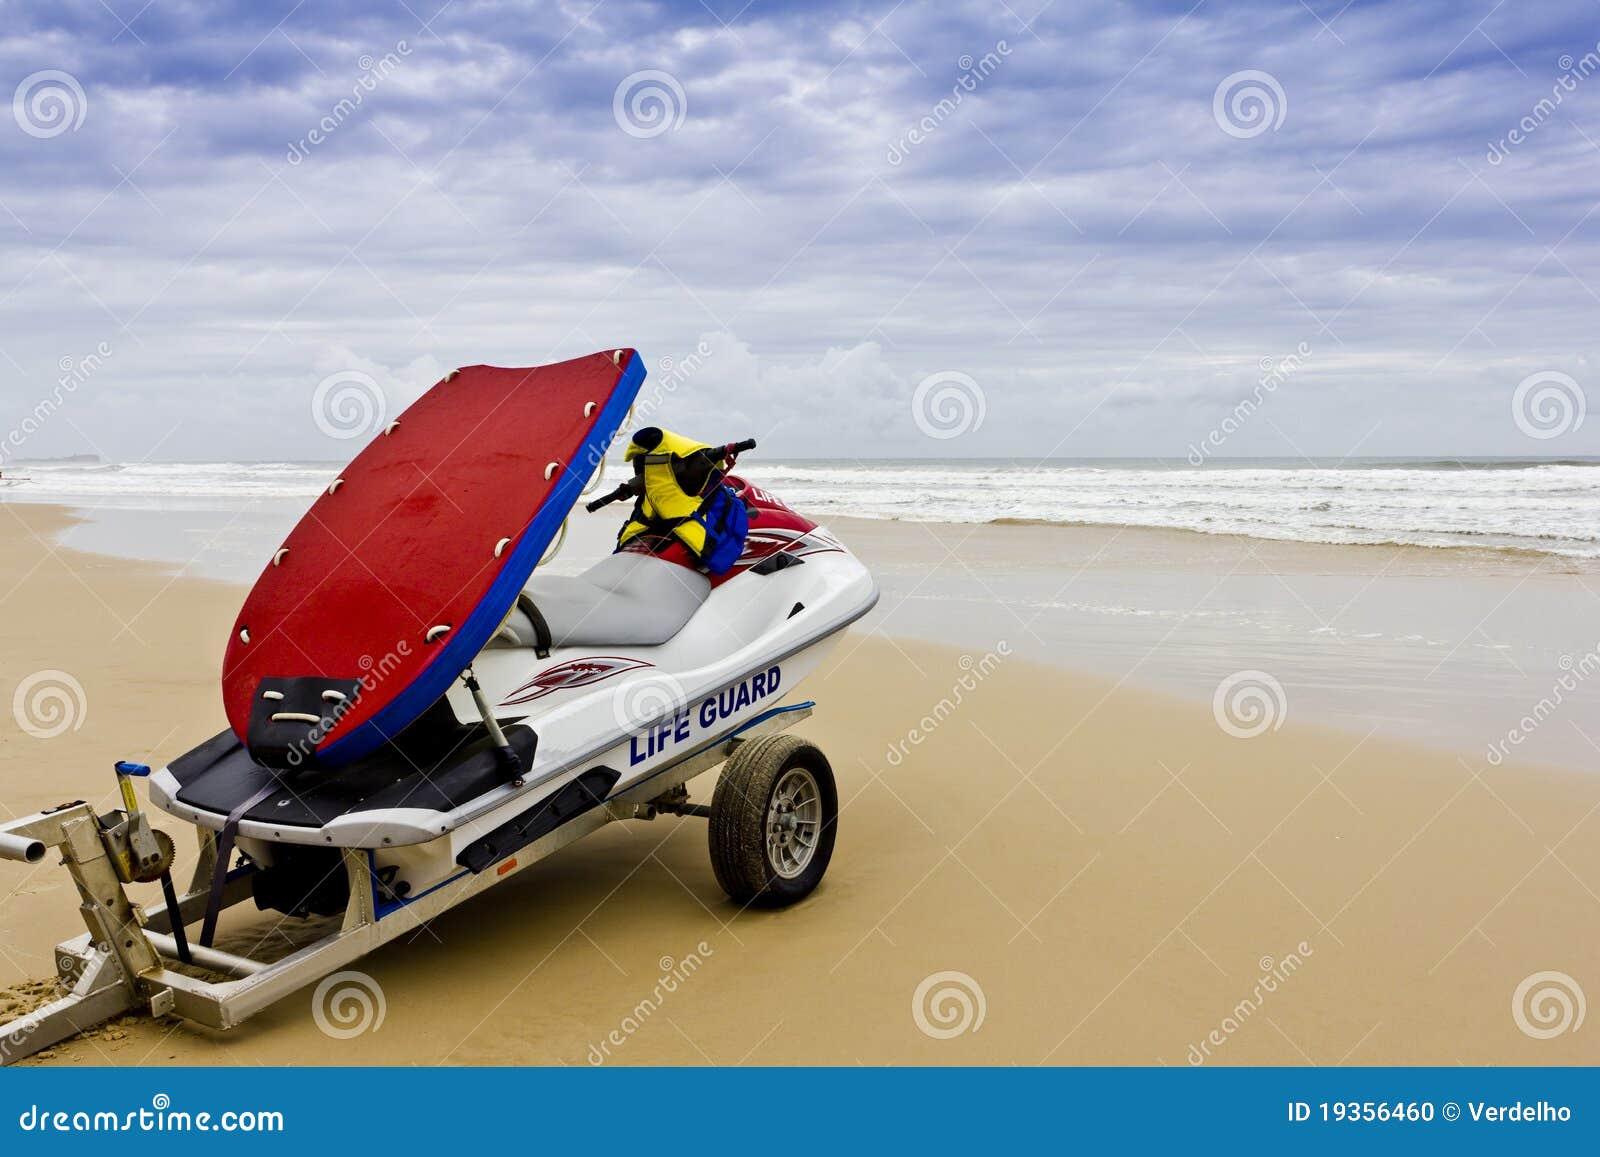 Bote de salvamento do Lifeguard - mares tormentosos